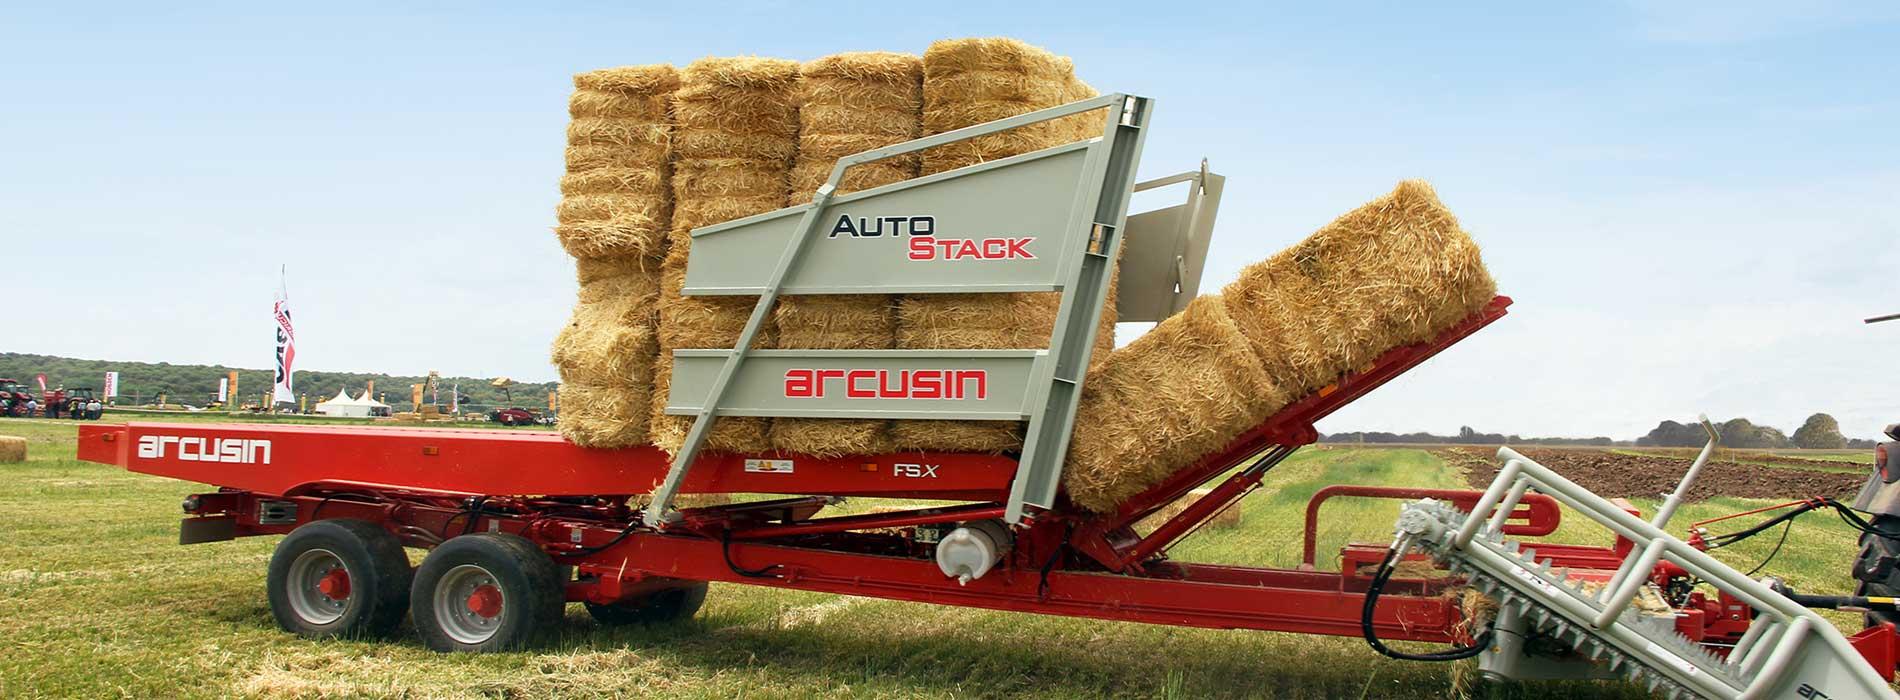 Welcome to Arcusin UK LTD